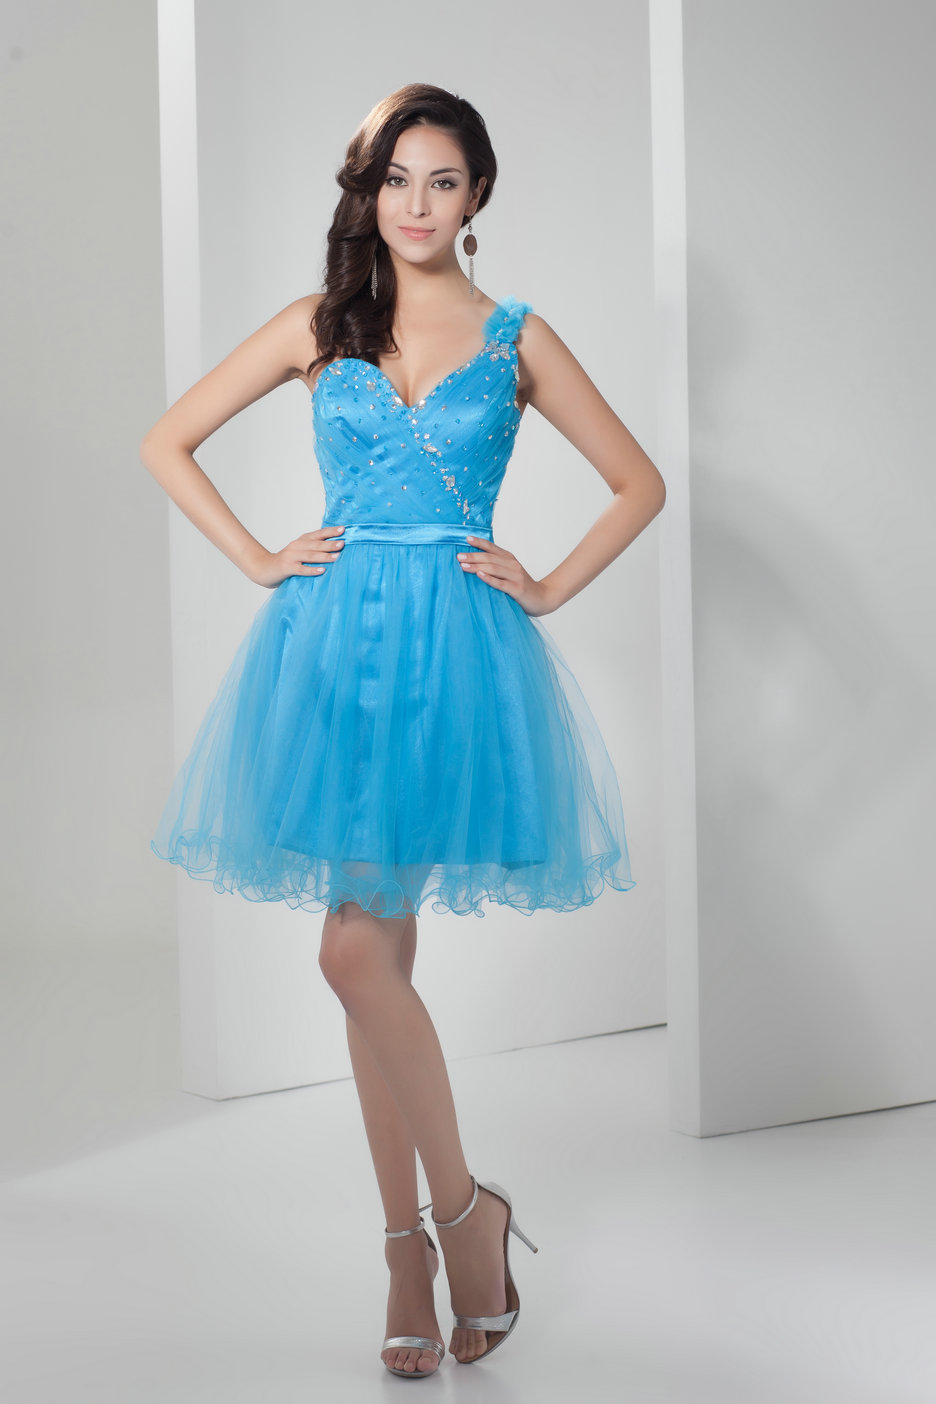 latest cocktail dresses - photo #1